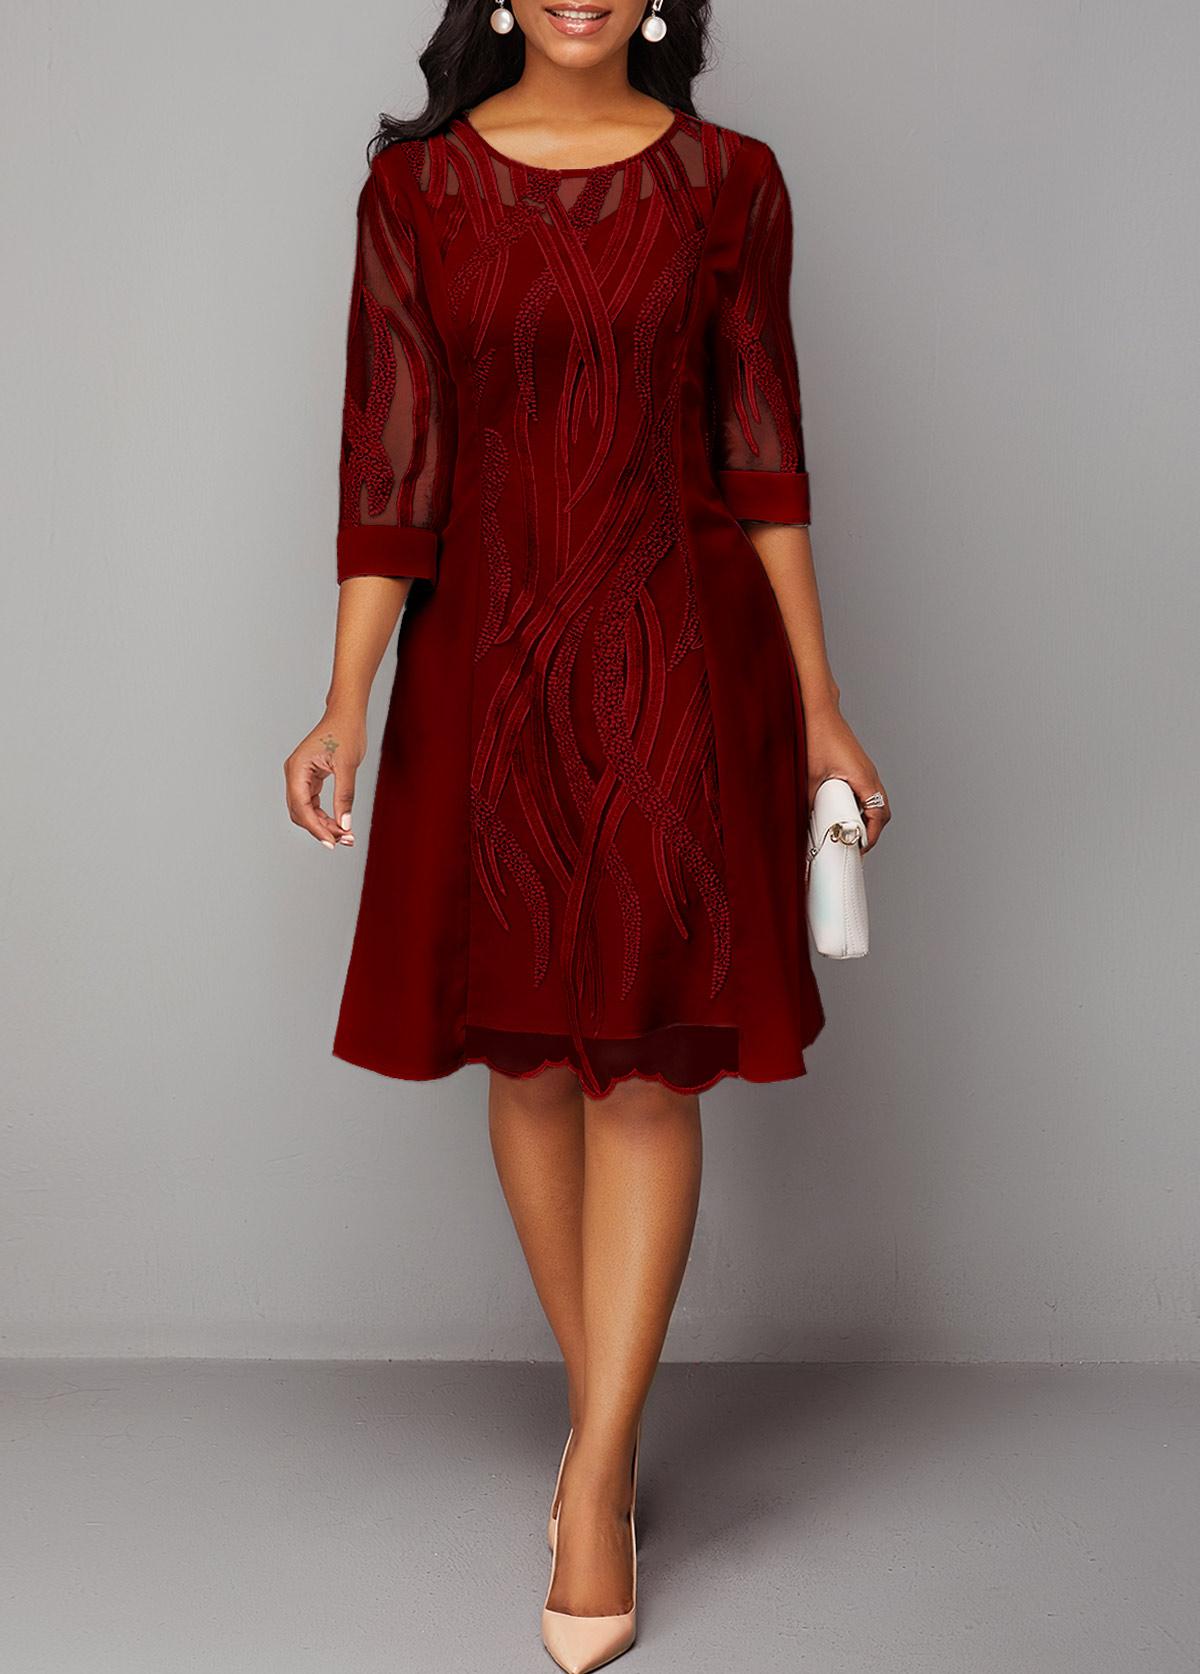 Wine Red Round Neck Back Zipper Lace Dress